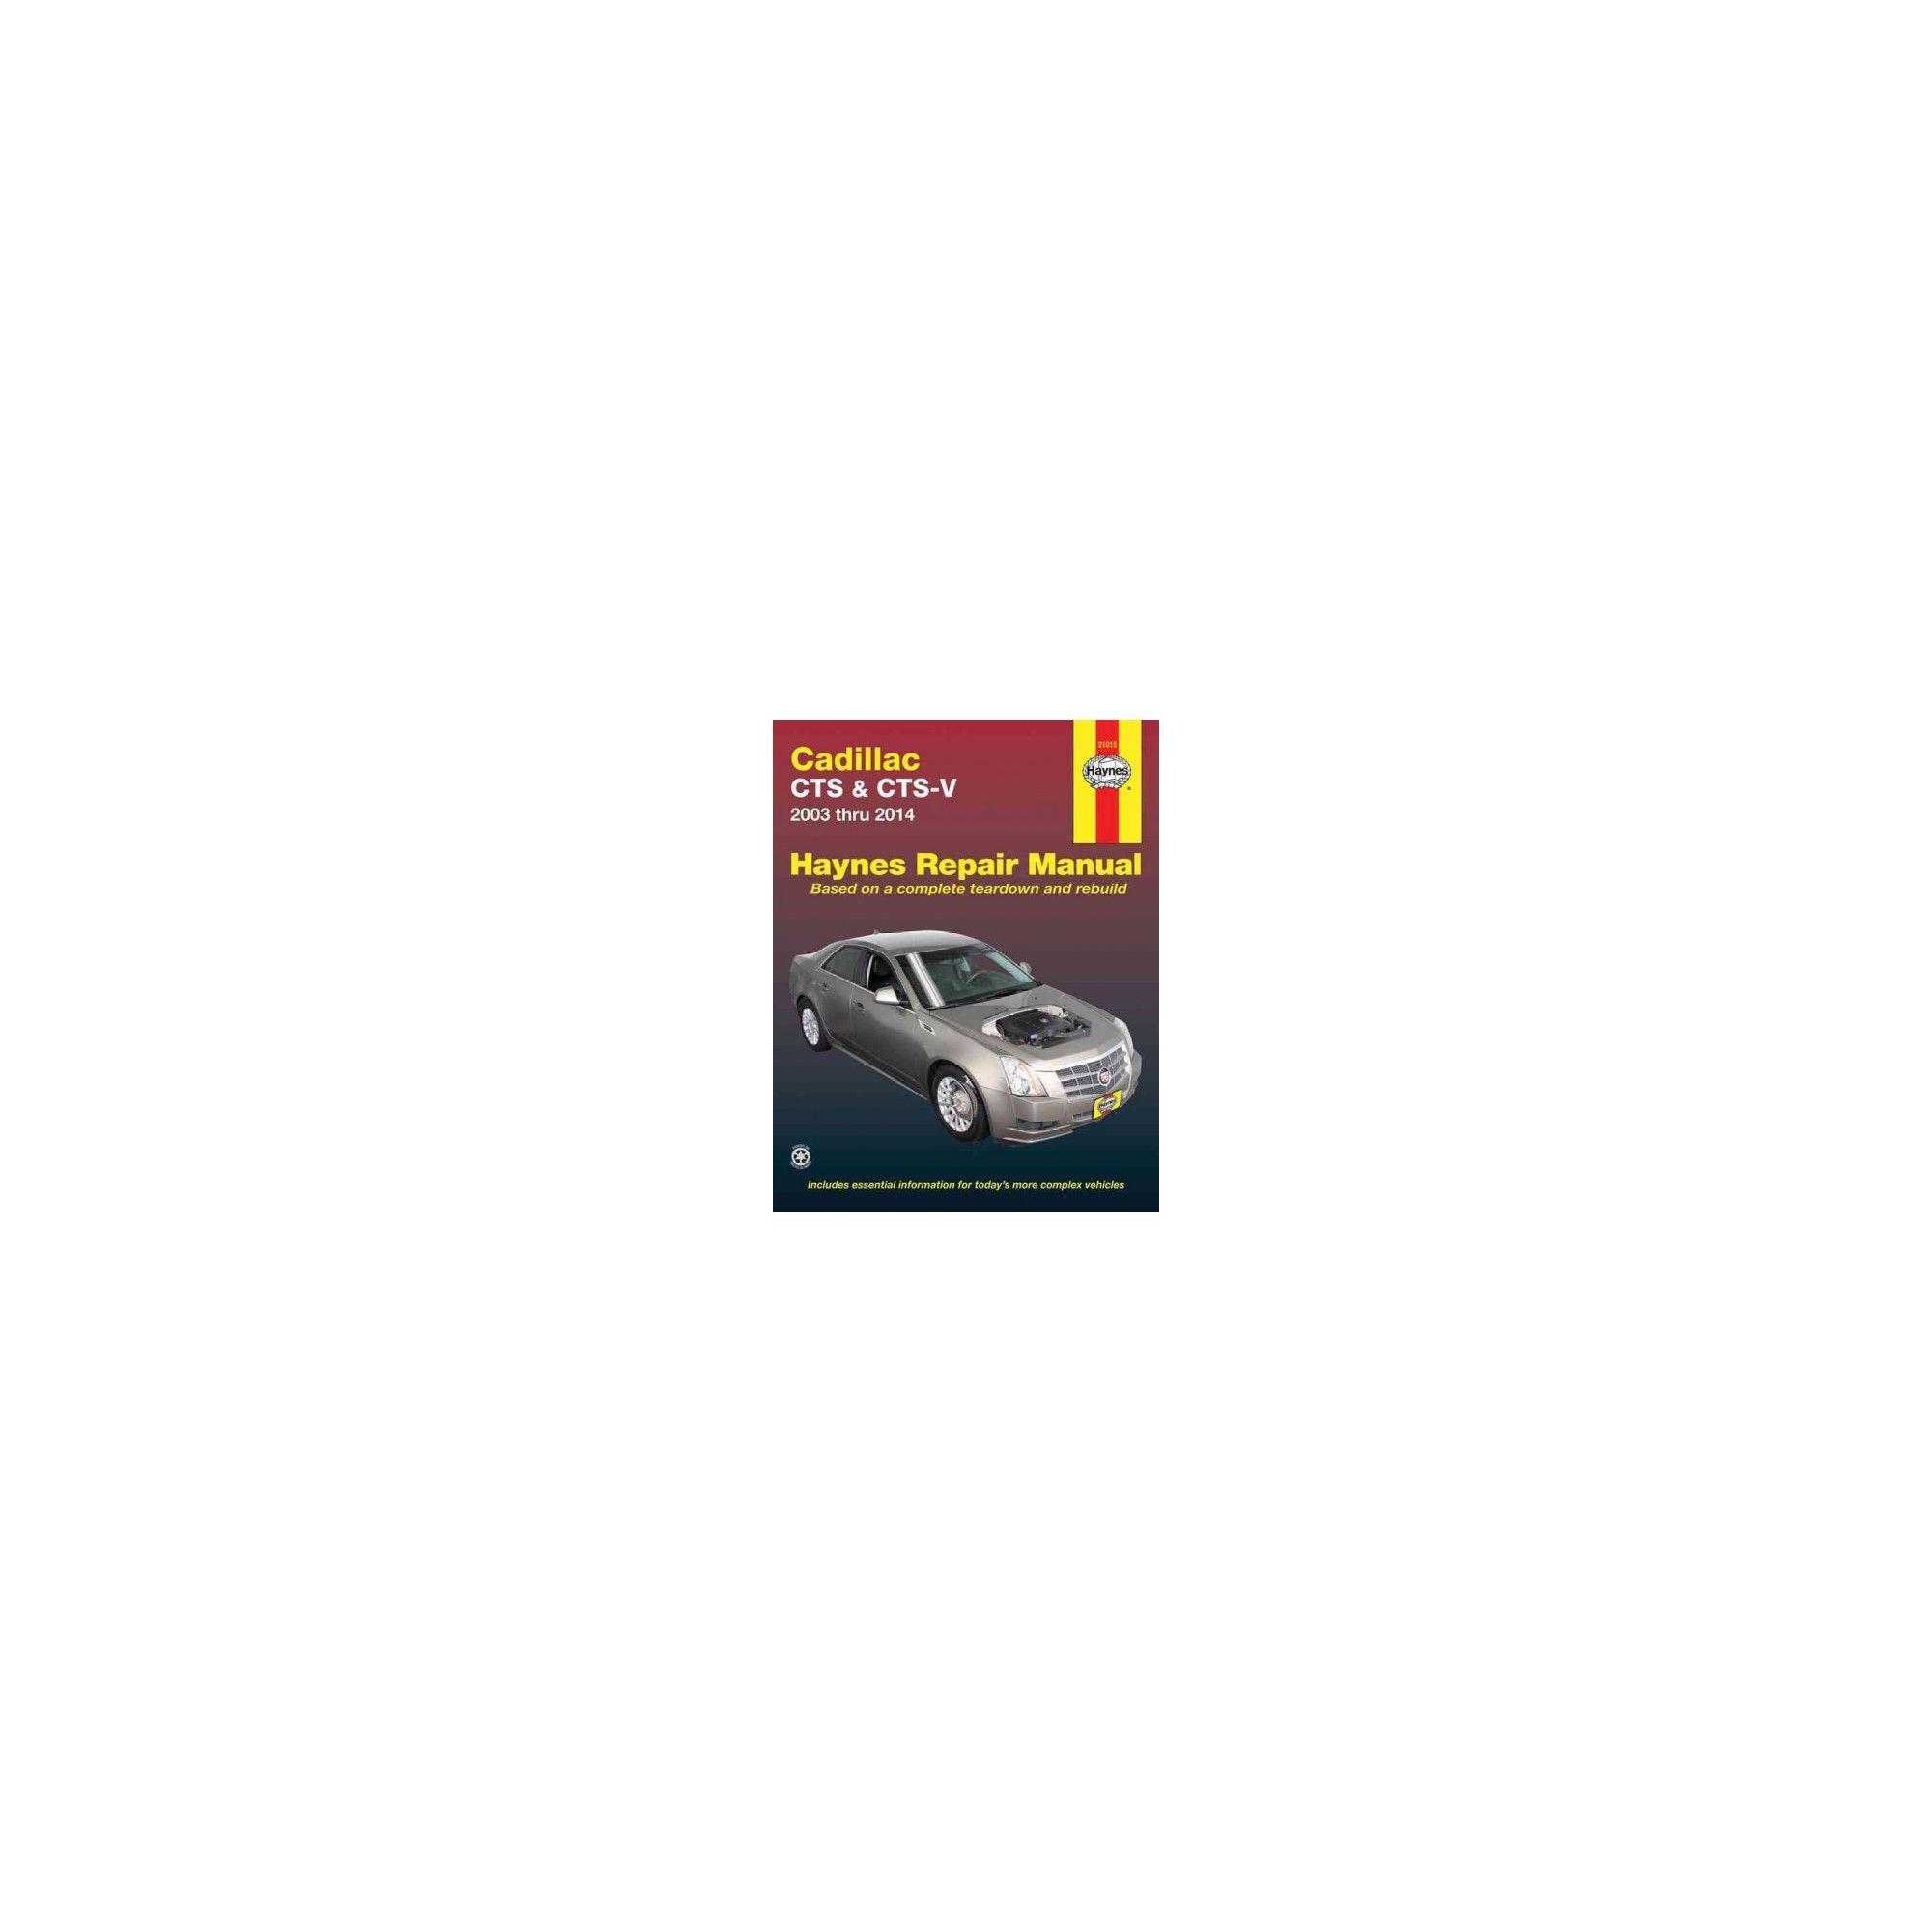 Haynes Cadillac Cts & Cts-V 2003 Thru 2014 Automotive Repair Manual  (Paperback) (Jeff Killingsworth &